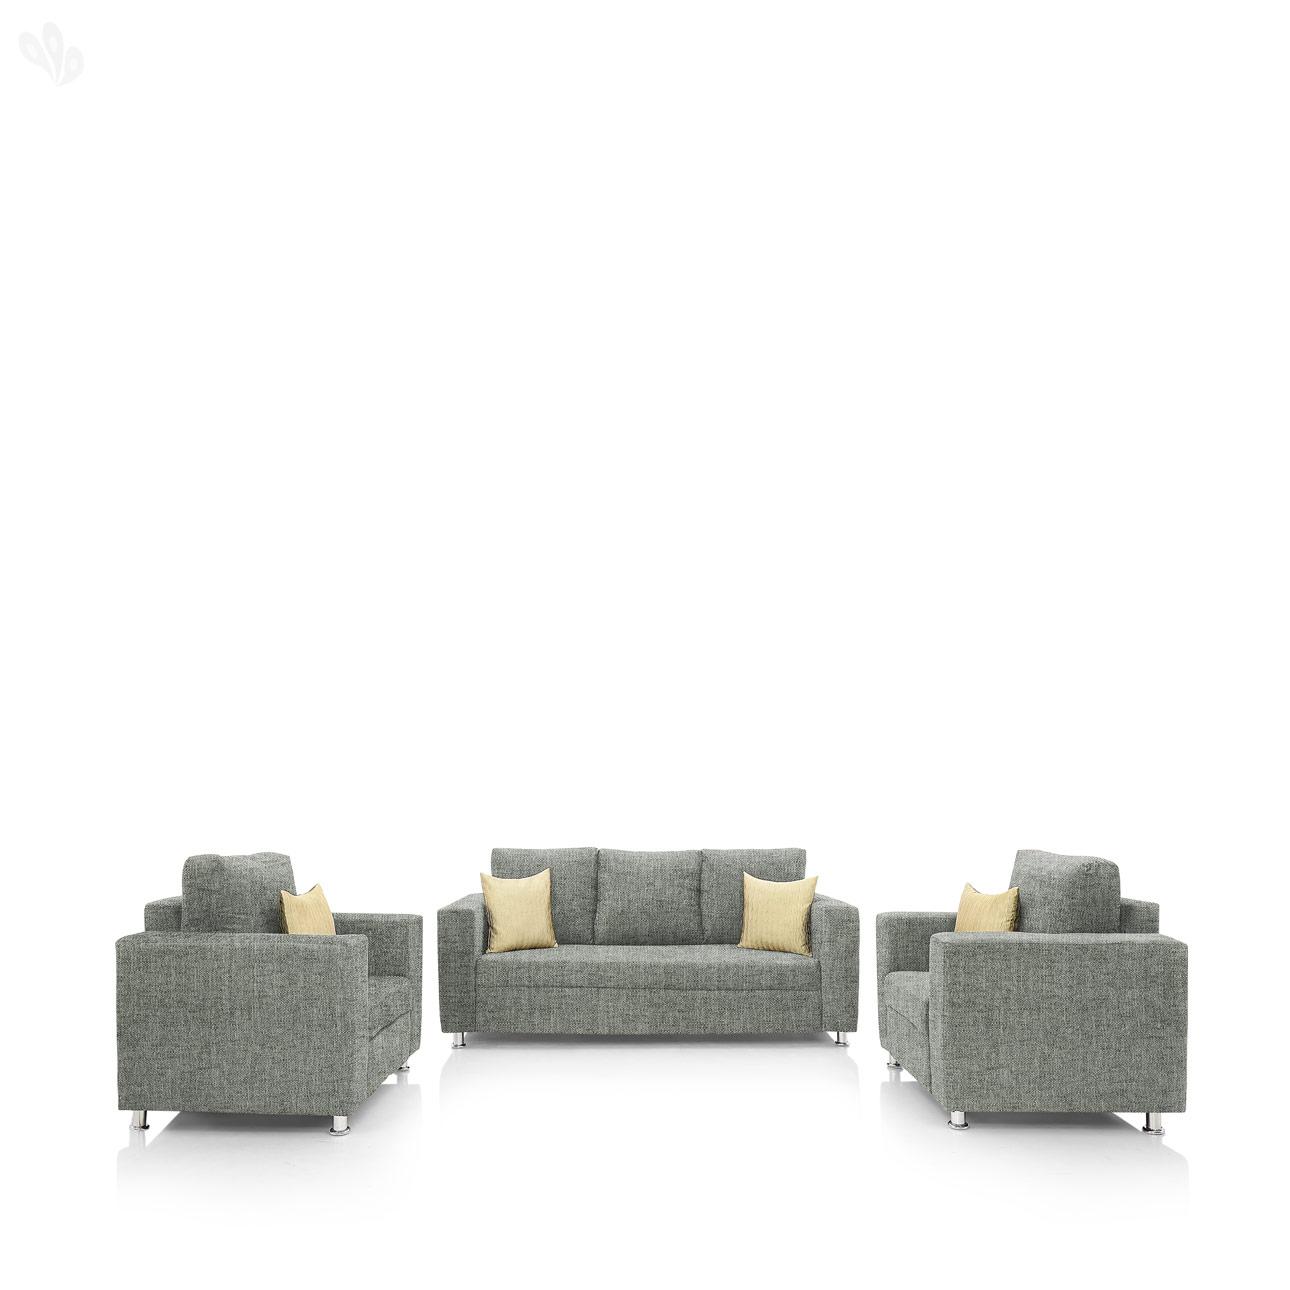 furniture4U   Fully Upholstered Sofa Set   Premium Valencia Grey  3+1+1